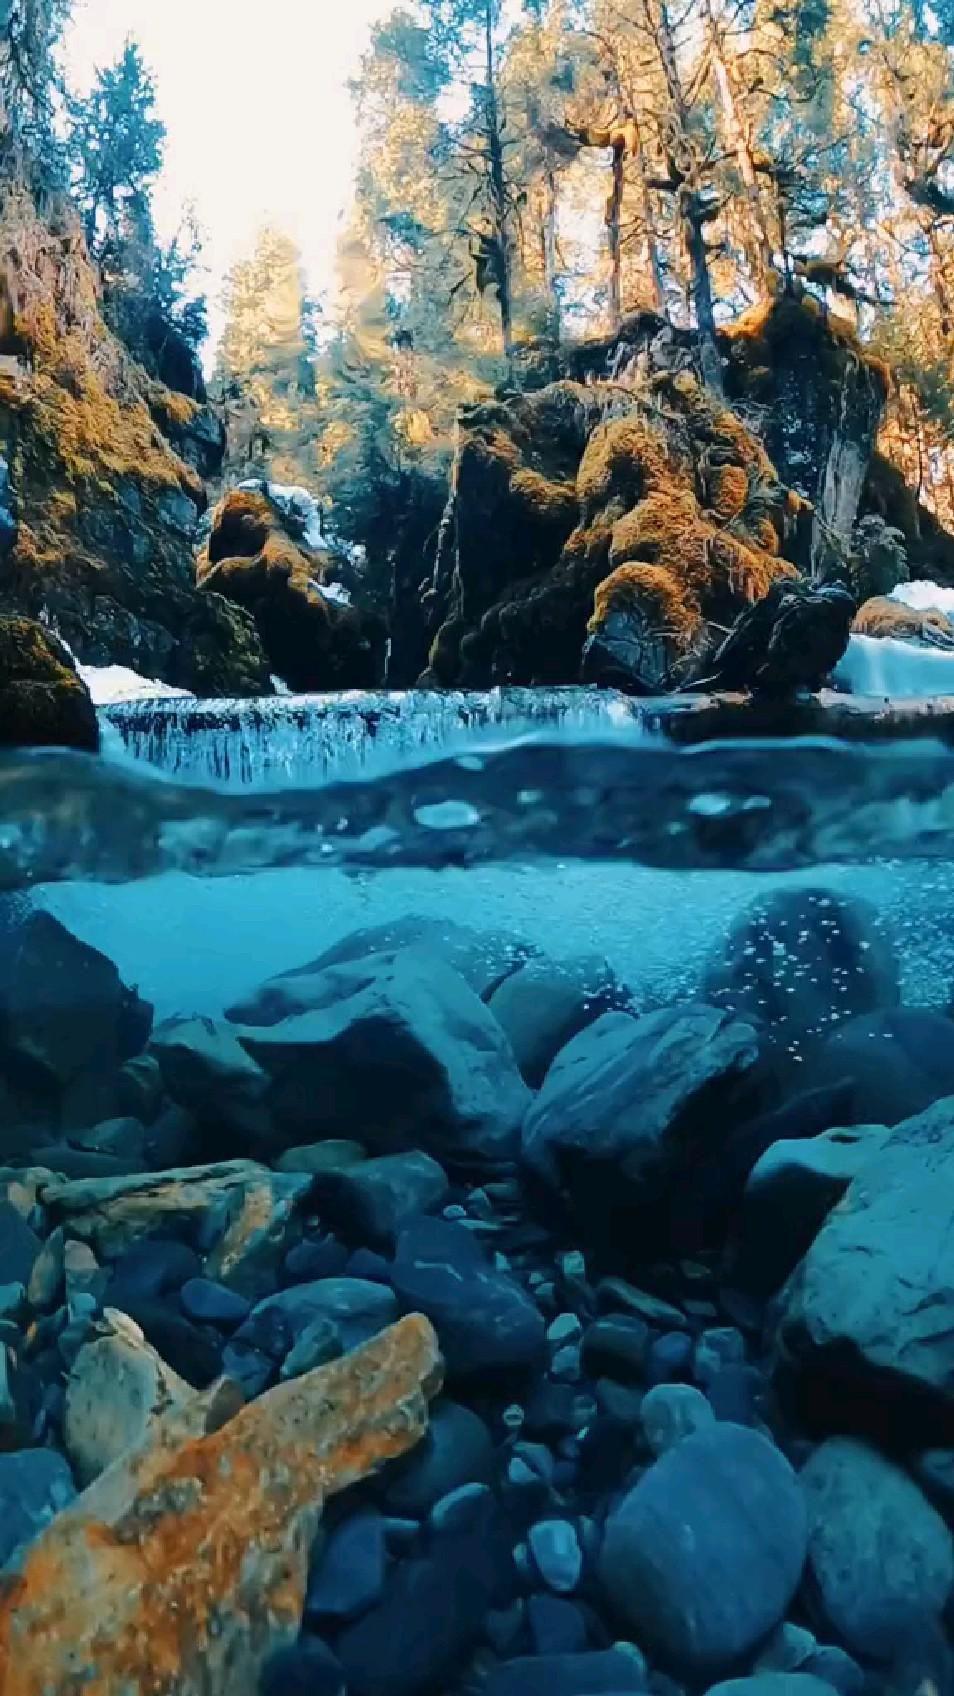 Alaska Waterfall 😍 So pretty✨